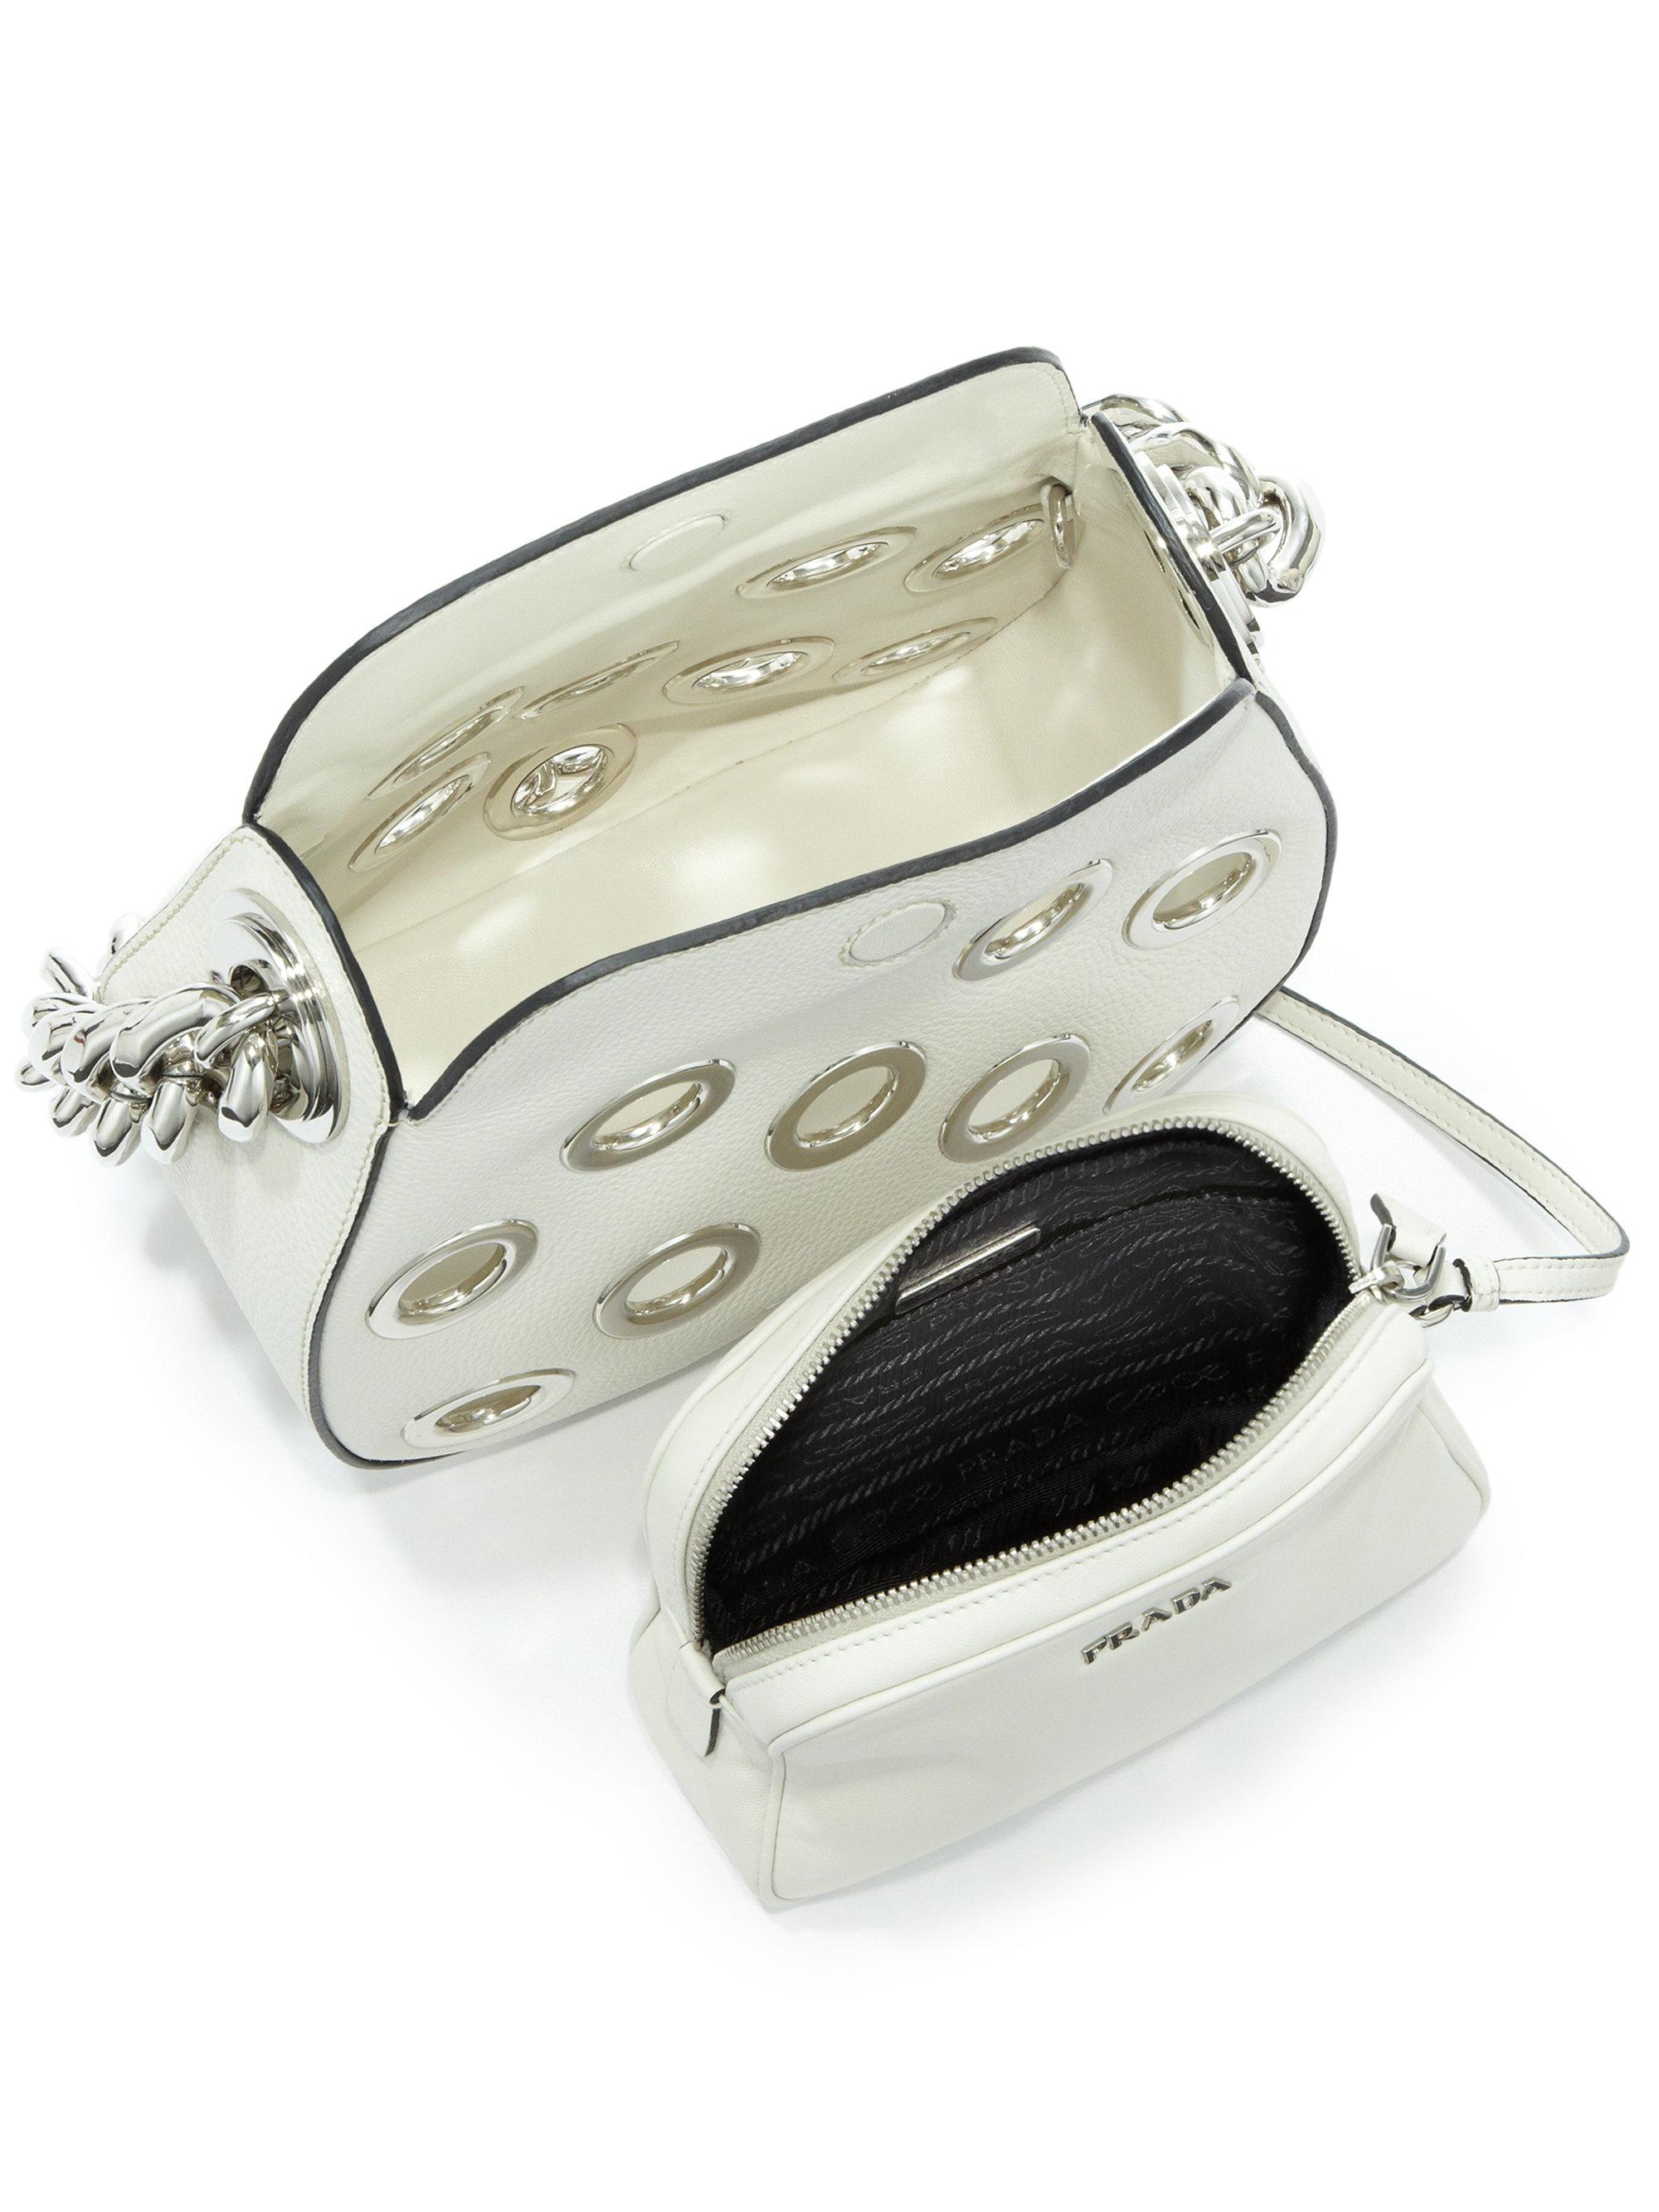 prada handbags black leather - Prada Daino Chain Hobo Bag With Grommets in White (ivory) | Lyst